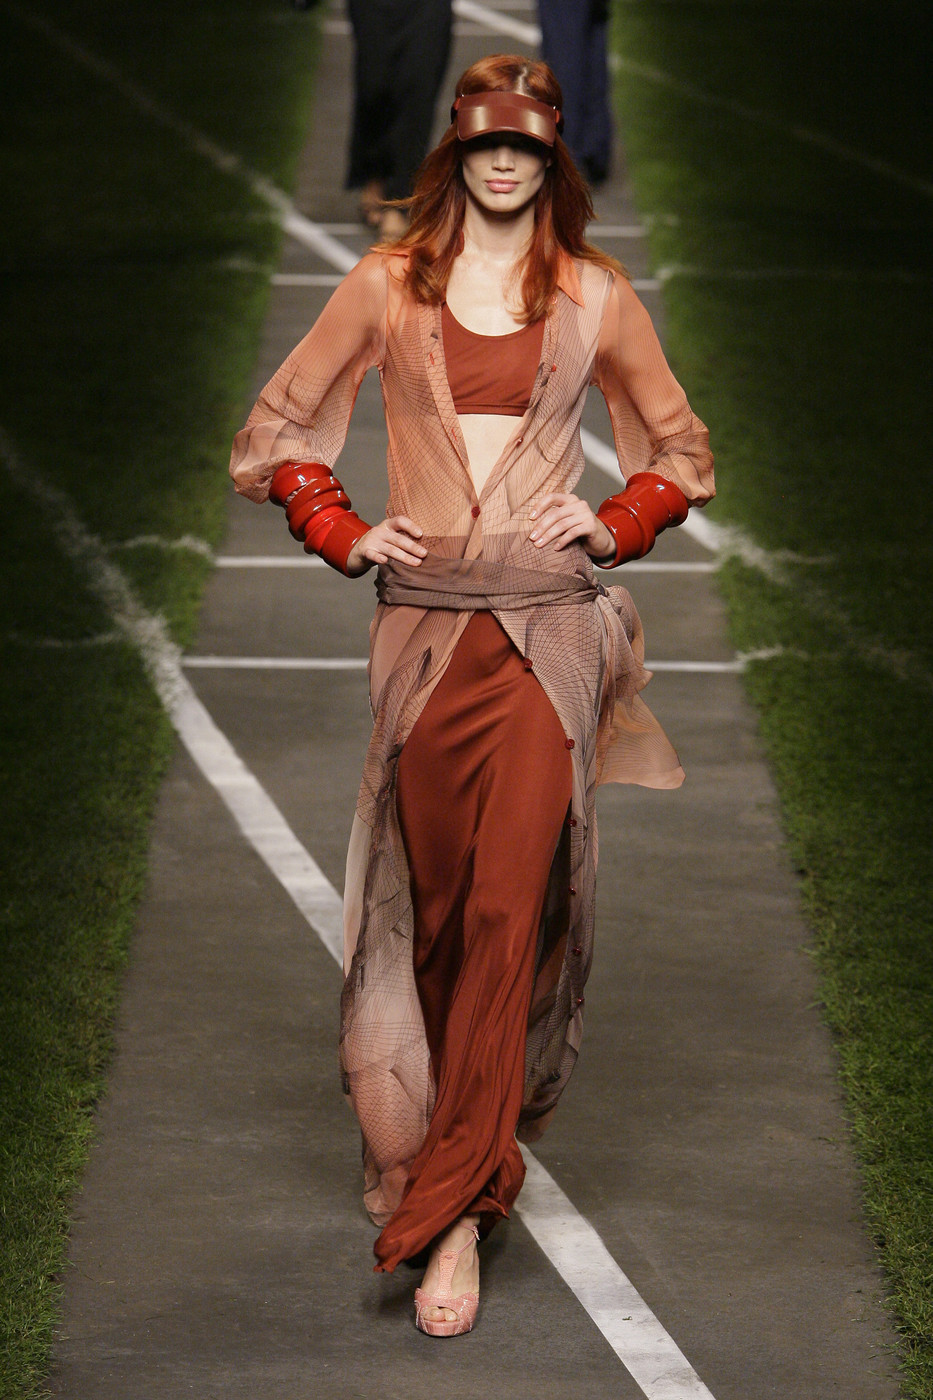 Rianne ten Haken at Hermes SS10 #Rianne ten Haken #hermes#fashion#runway#model#ss10#catwalk